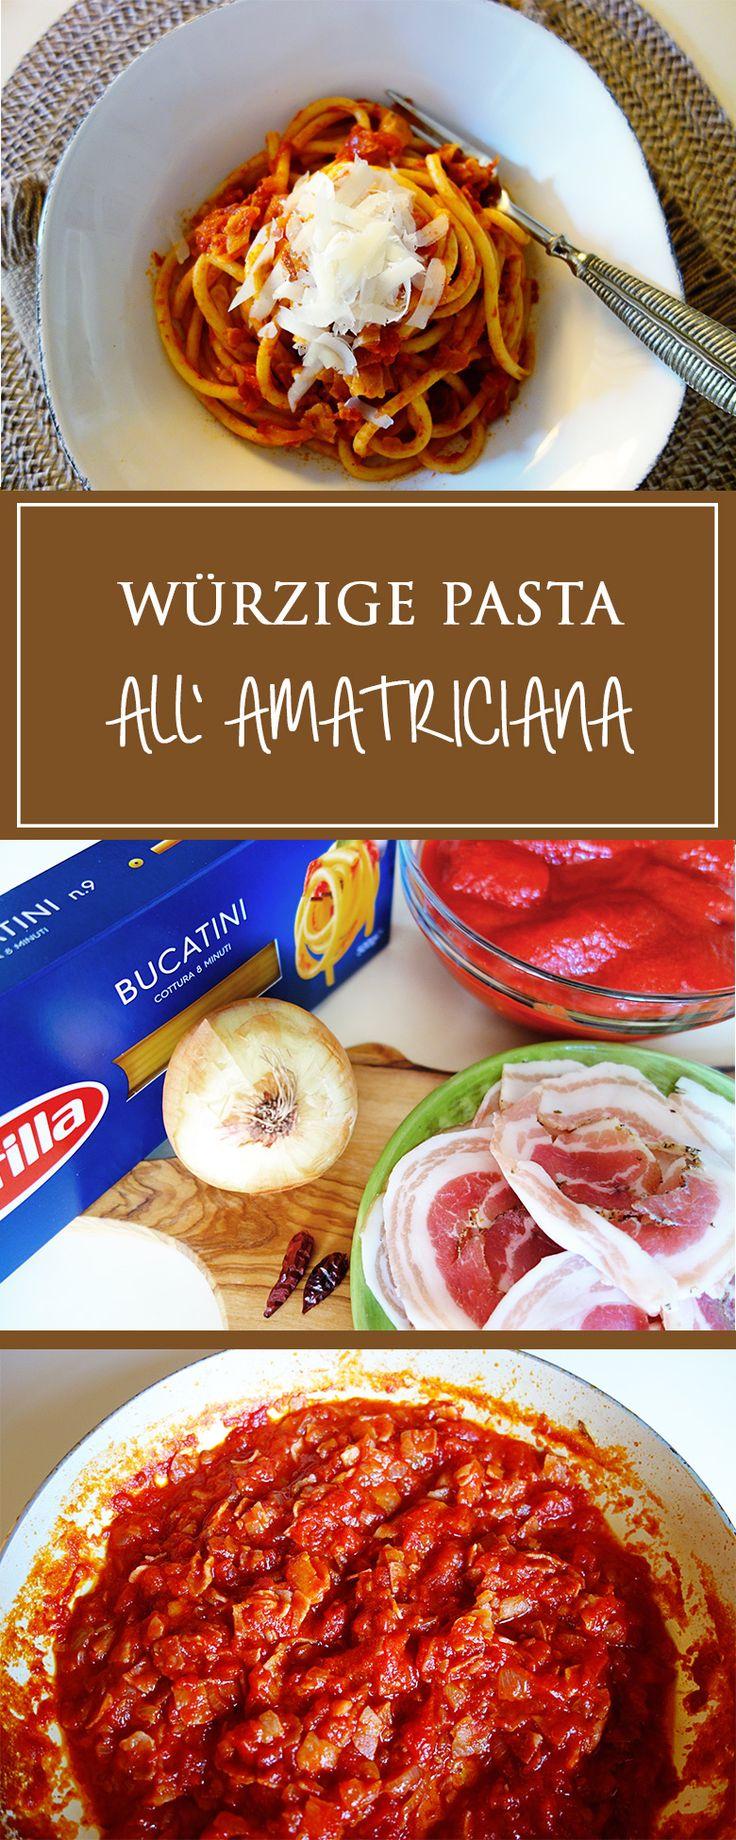 Bucatini all'Amatriciana - Tomaten, Bauchspeck, Zwiebel, etwas Chili &…